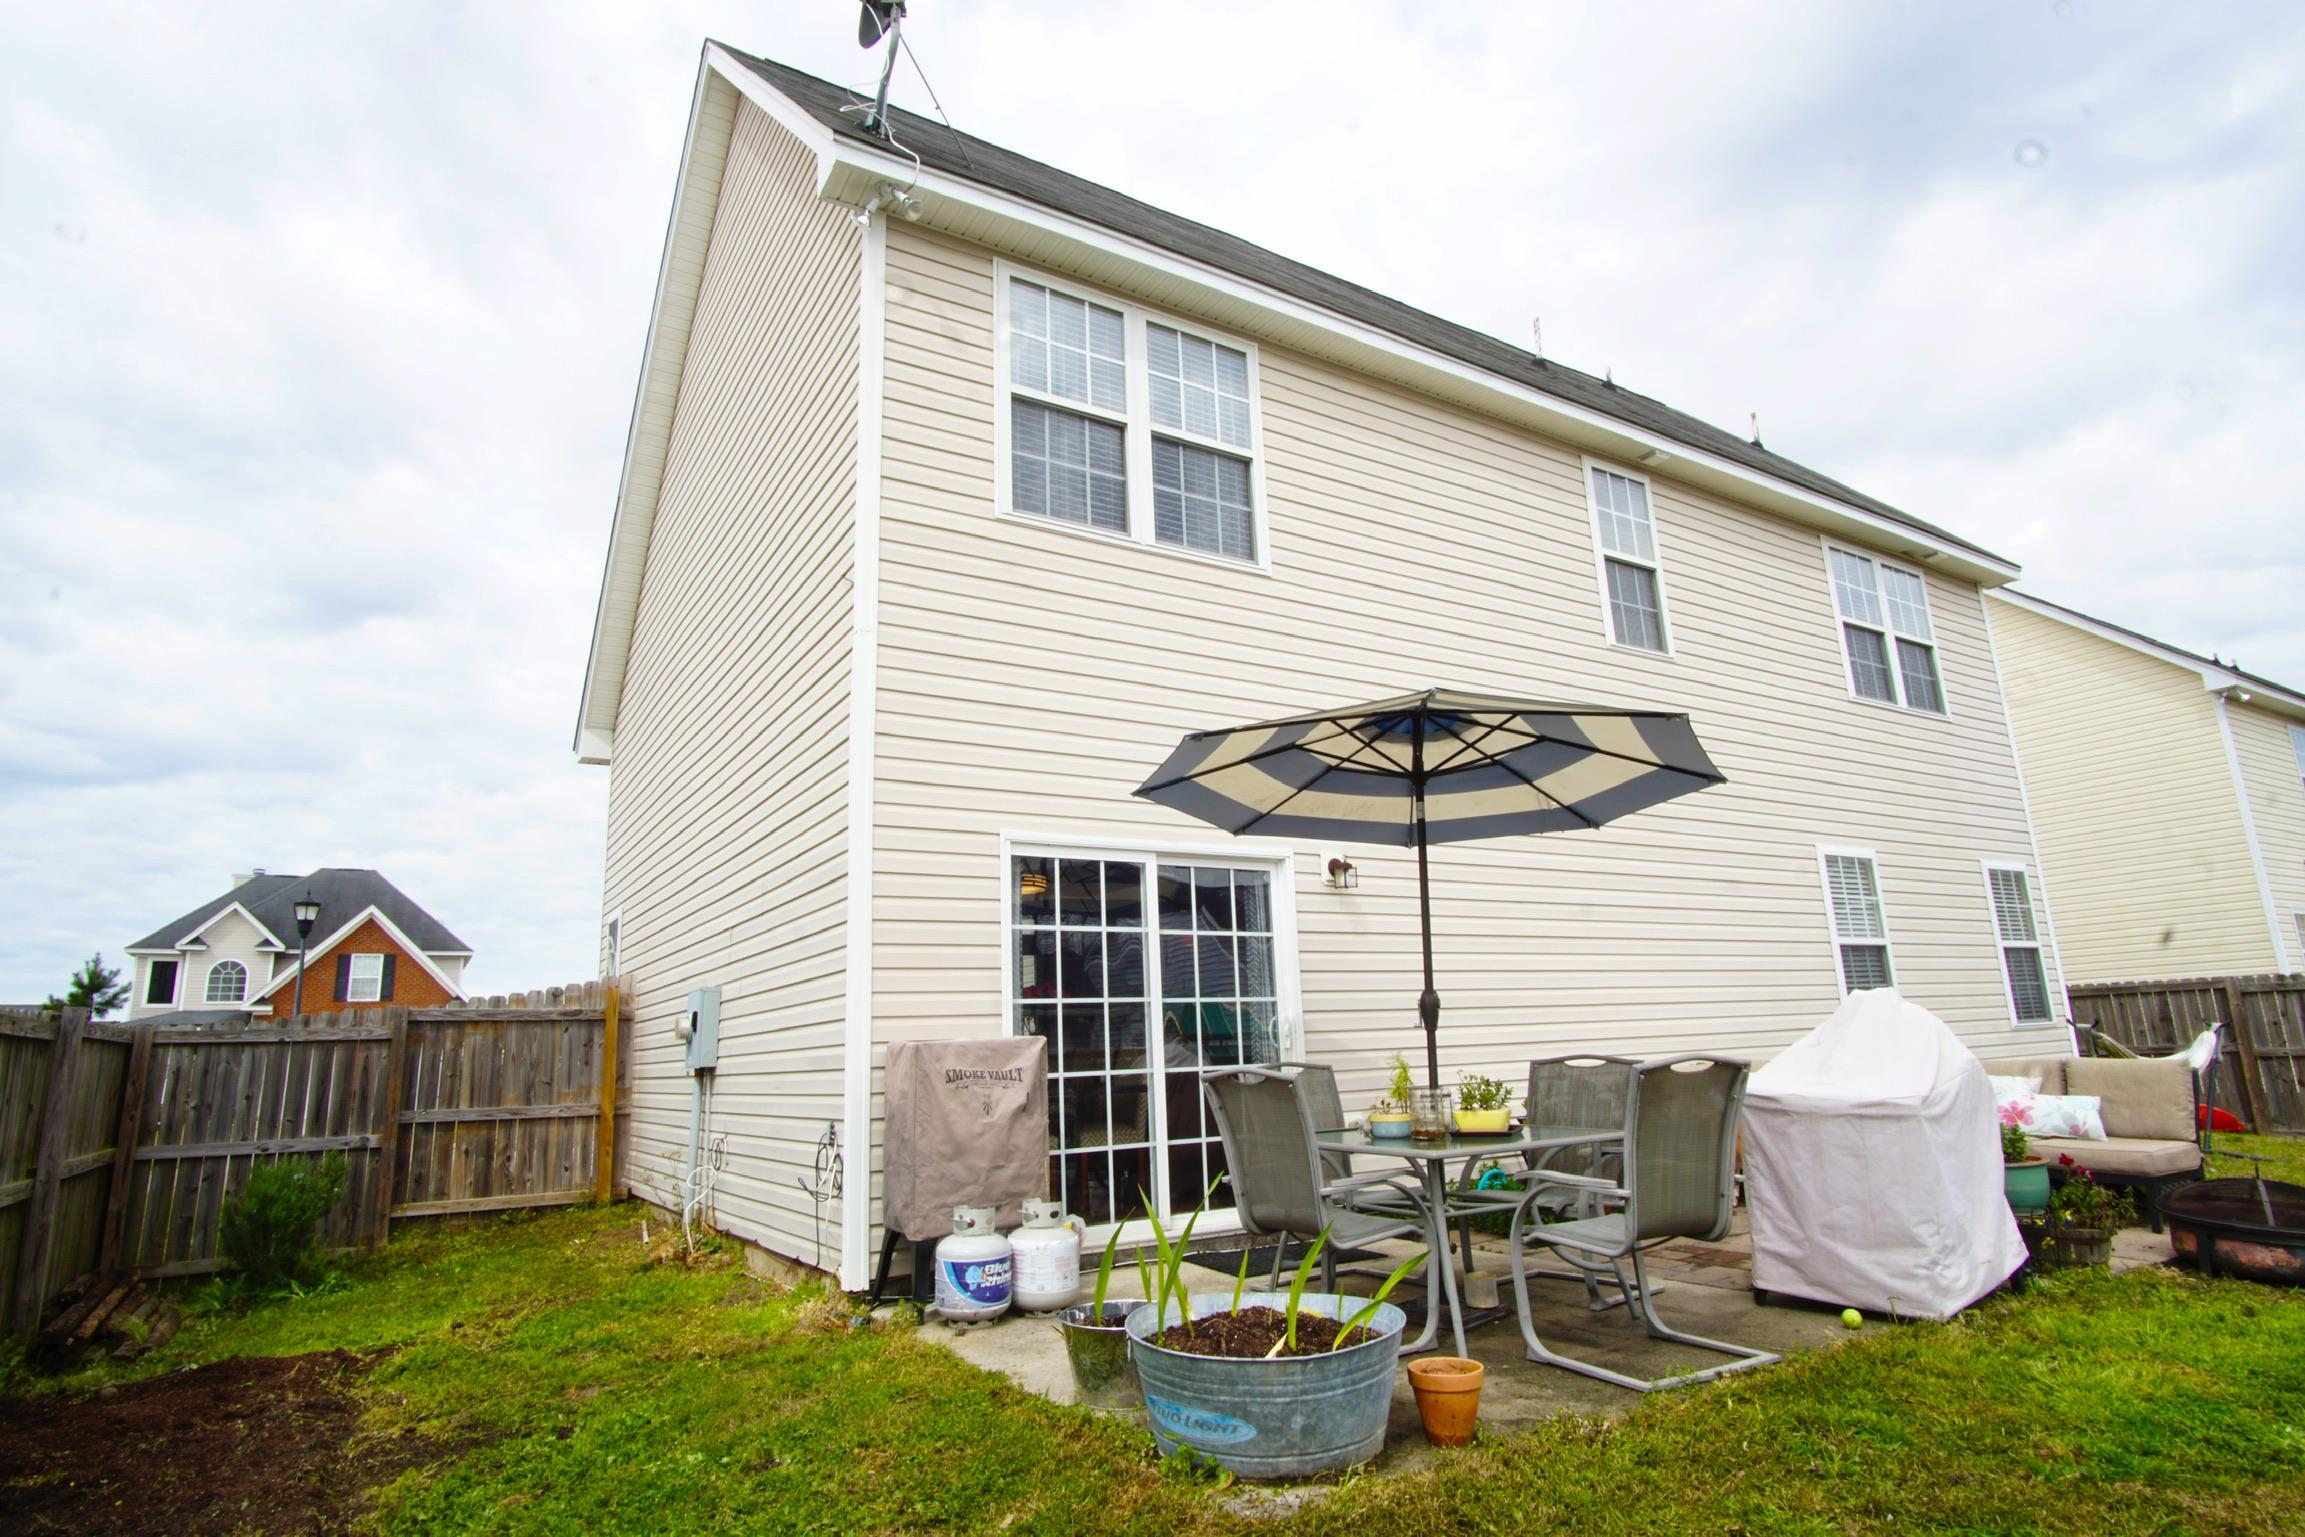 Colony North II Homes For Sale - 7828 Magellan, North Charleston, SC - 11